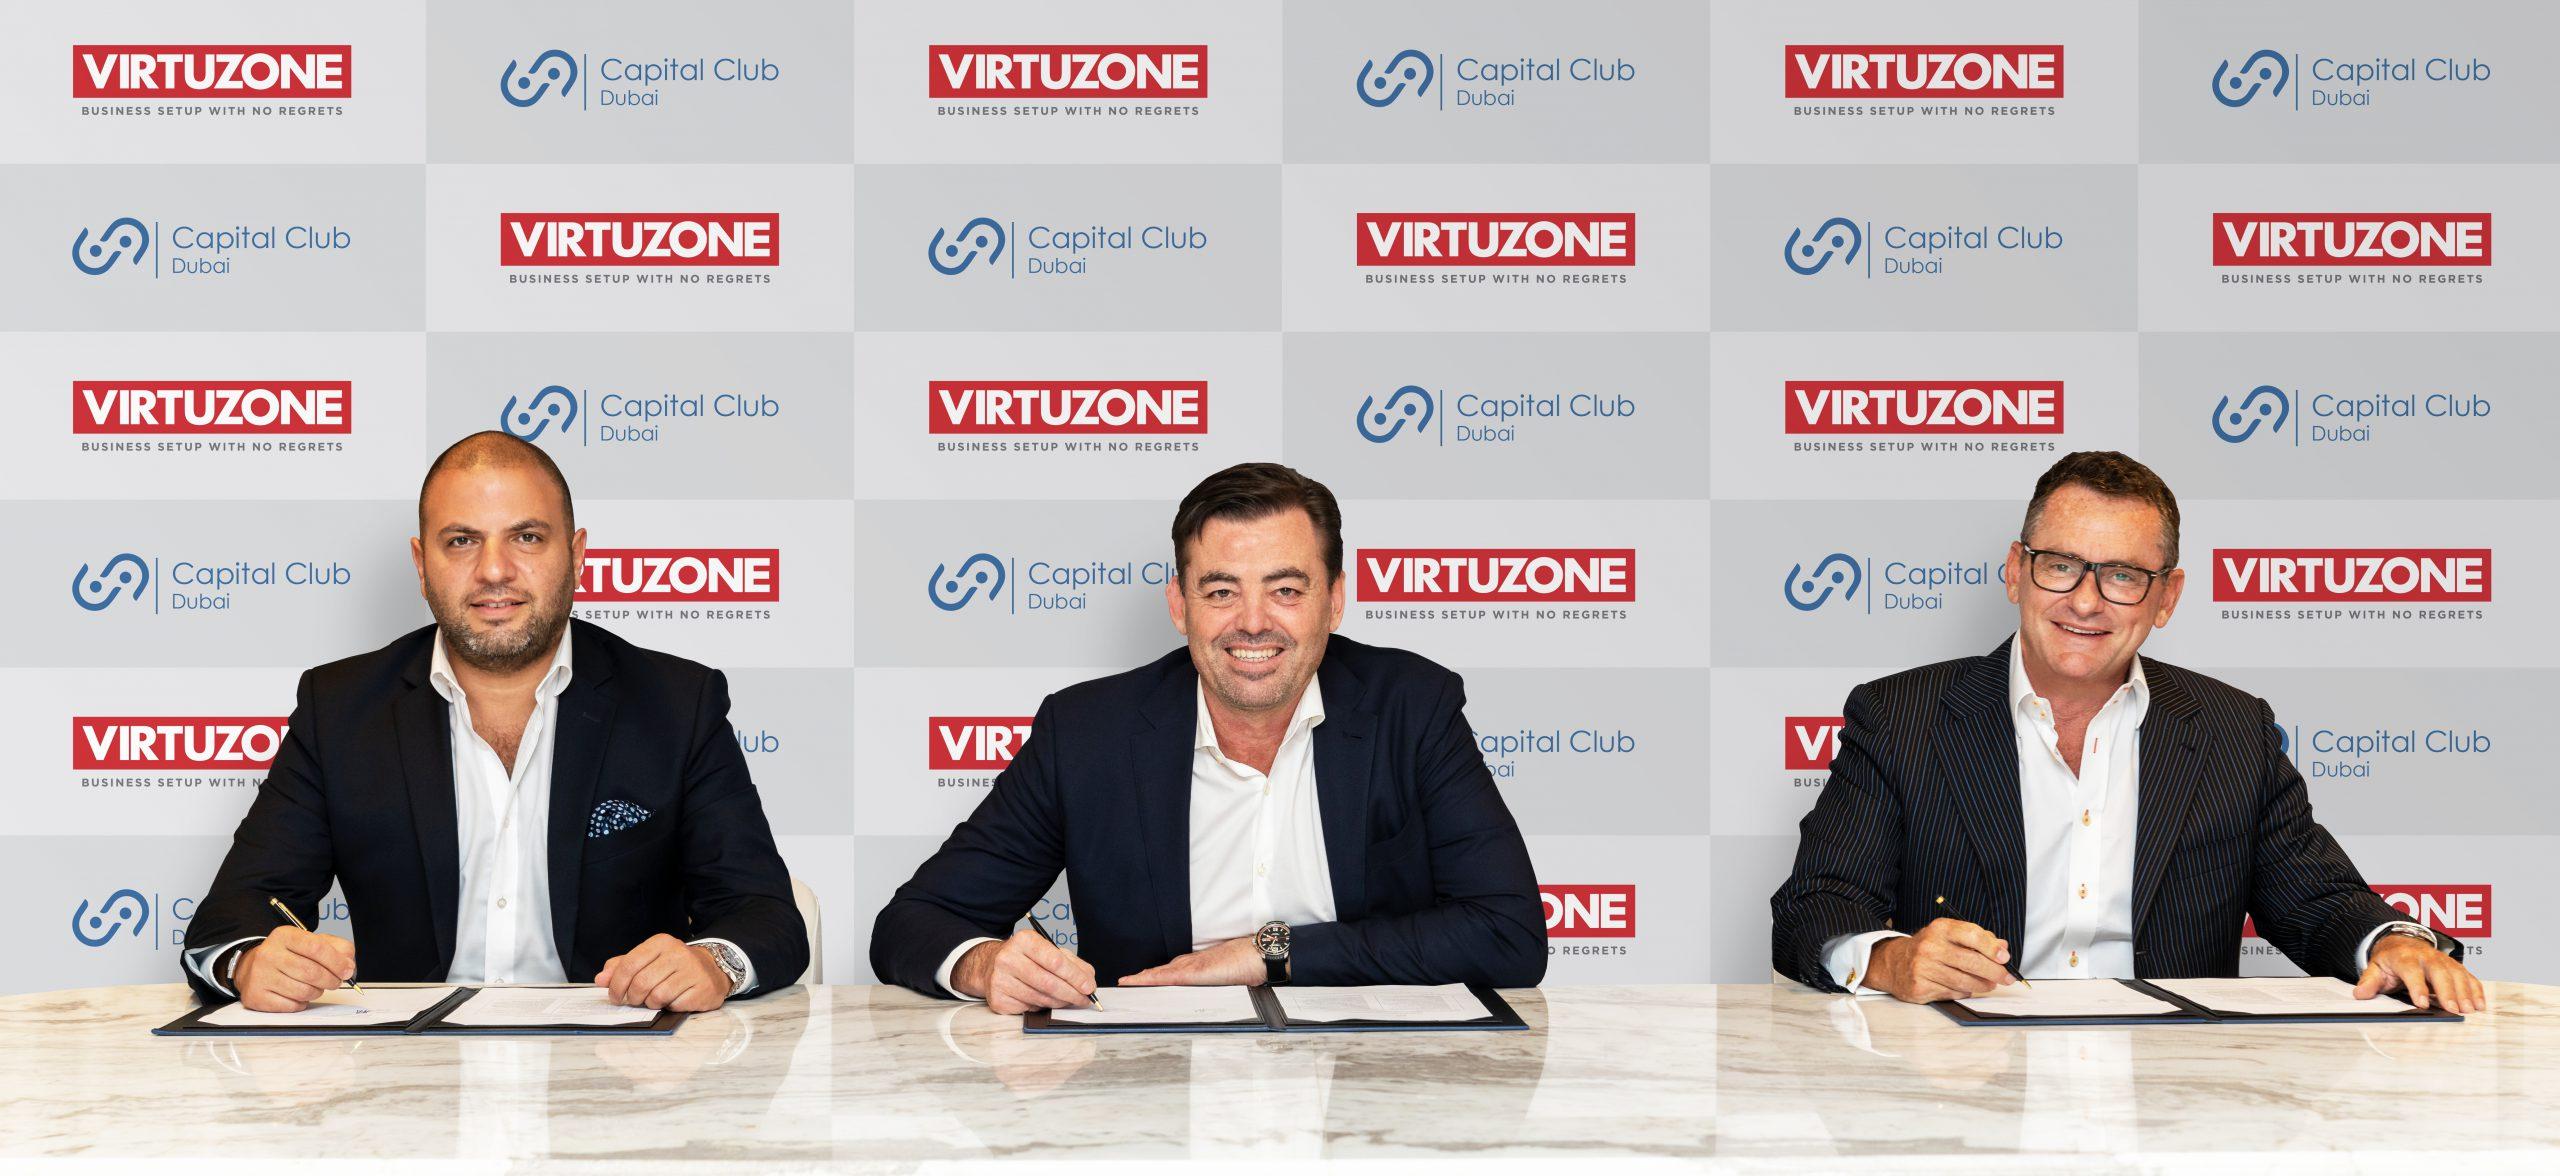 Virtuzone and Capital Club Partnership